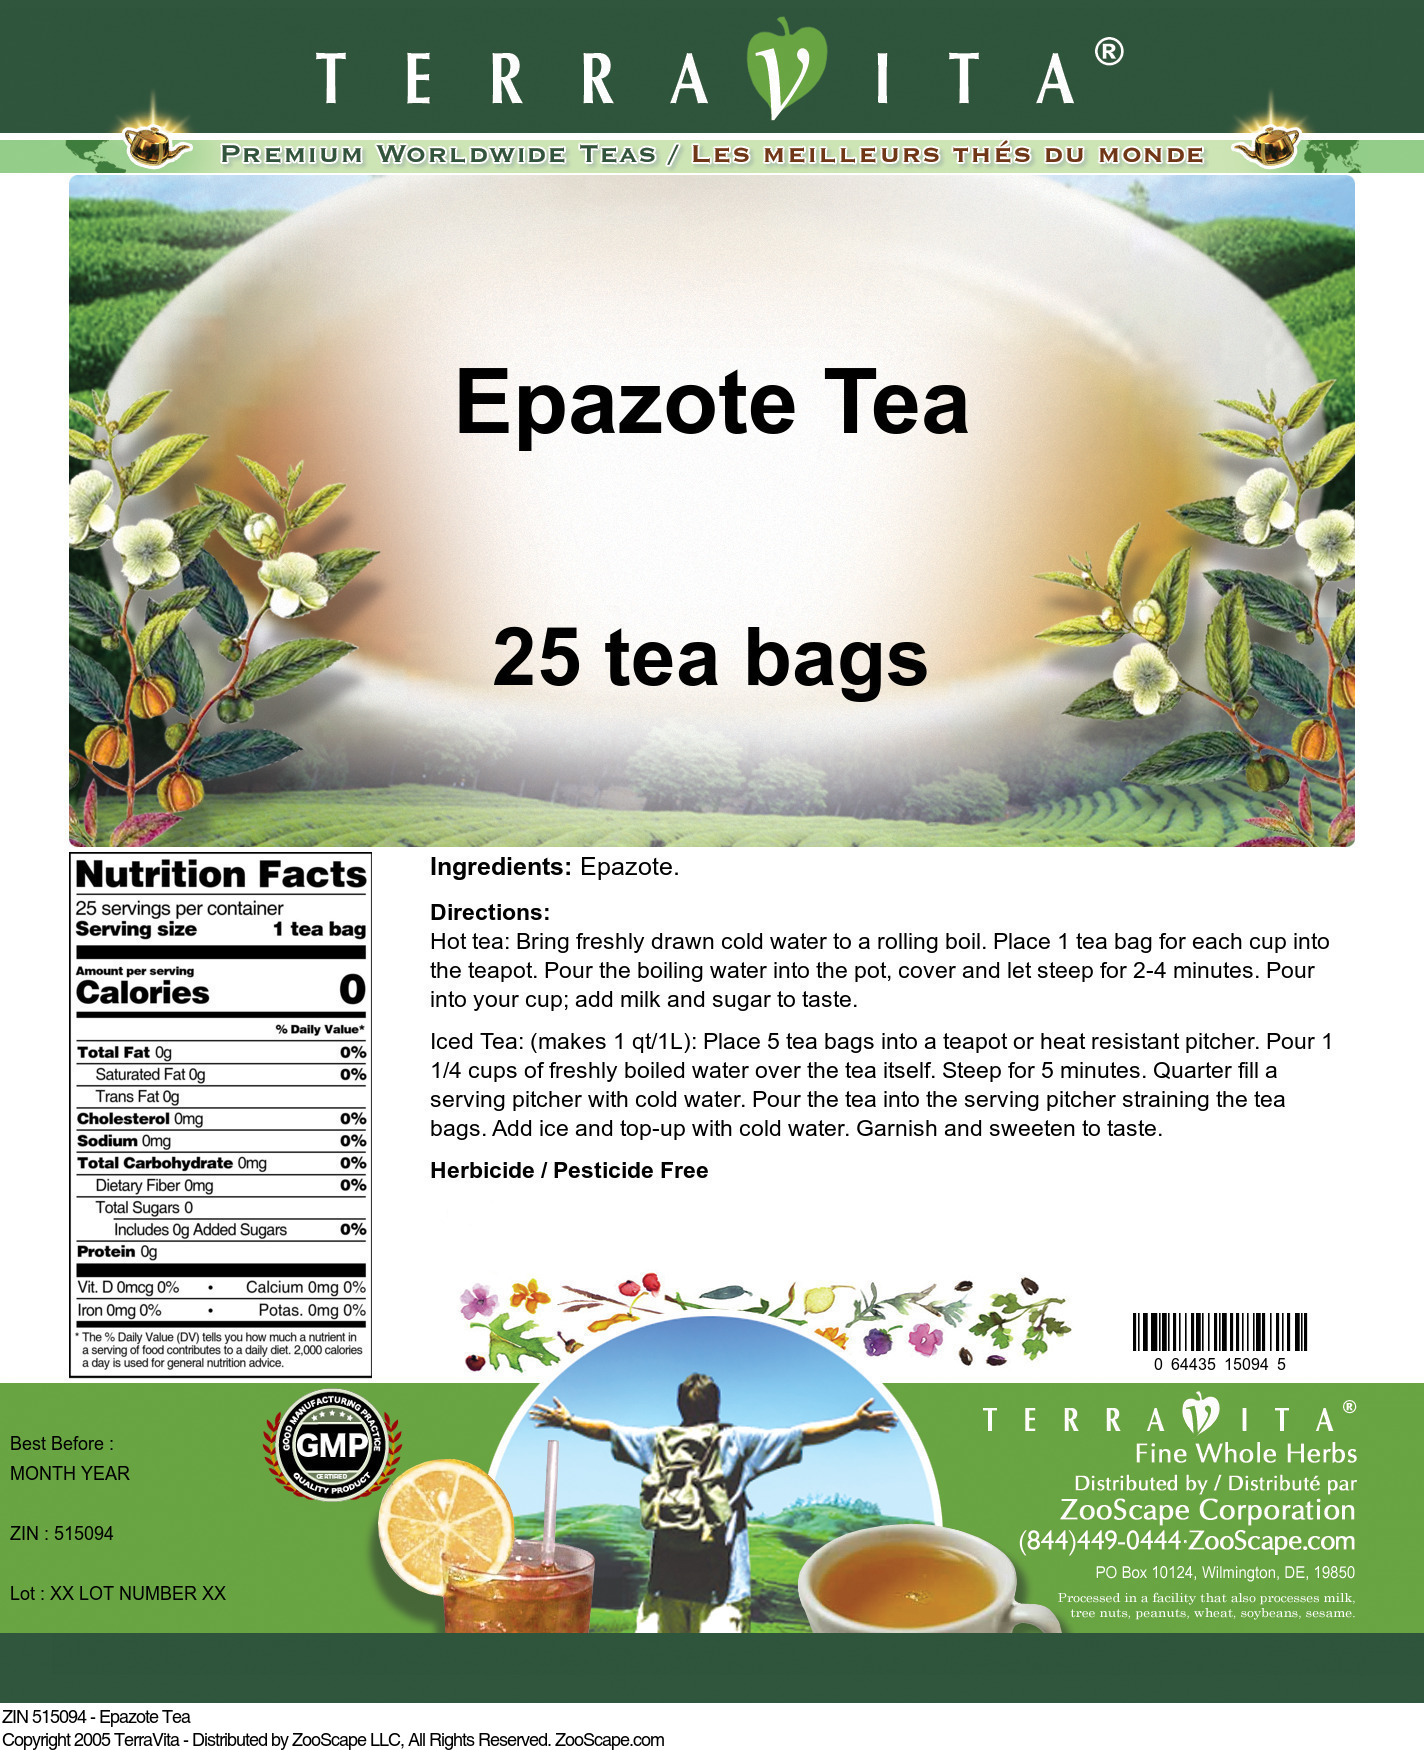 Epazote Tea